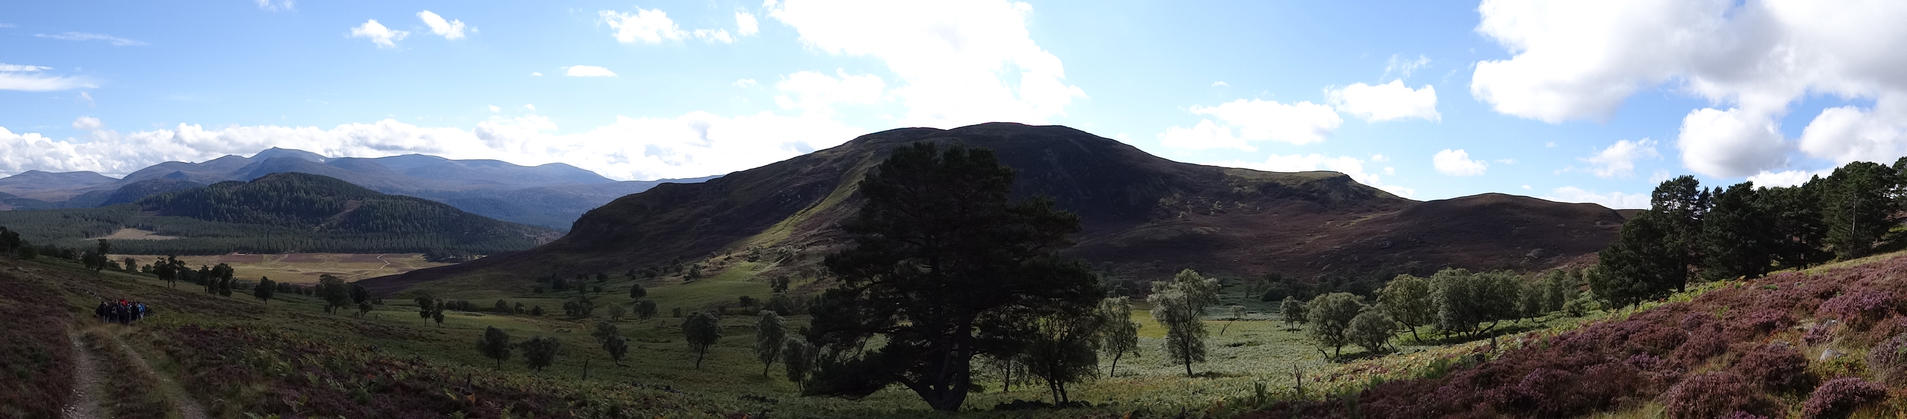 Scotland Highlands Panorama by Corycat